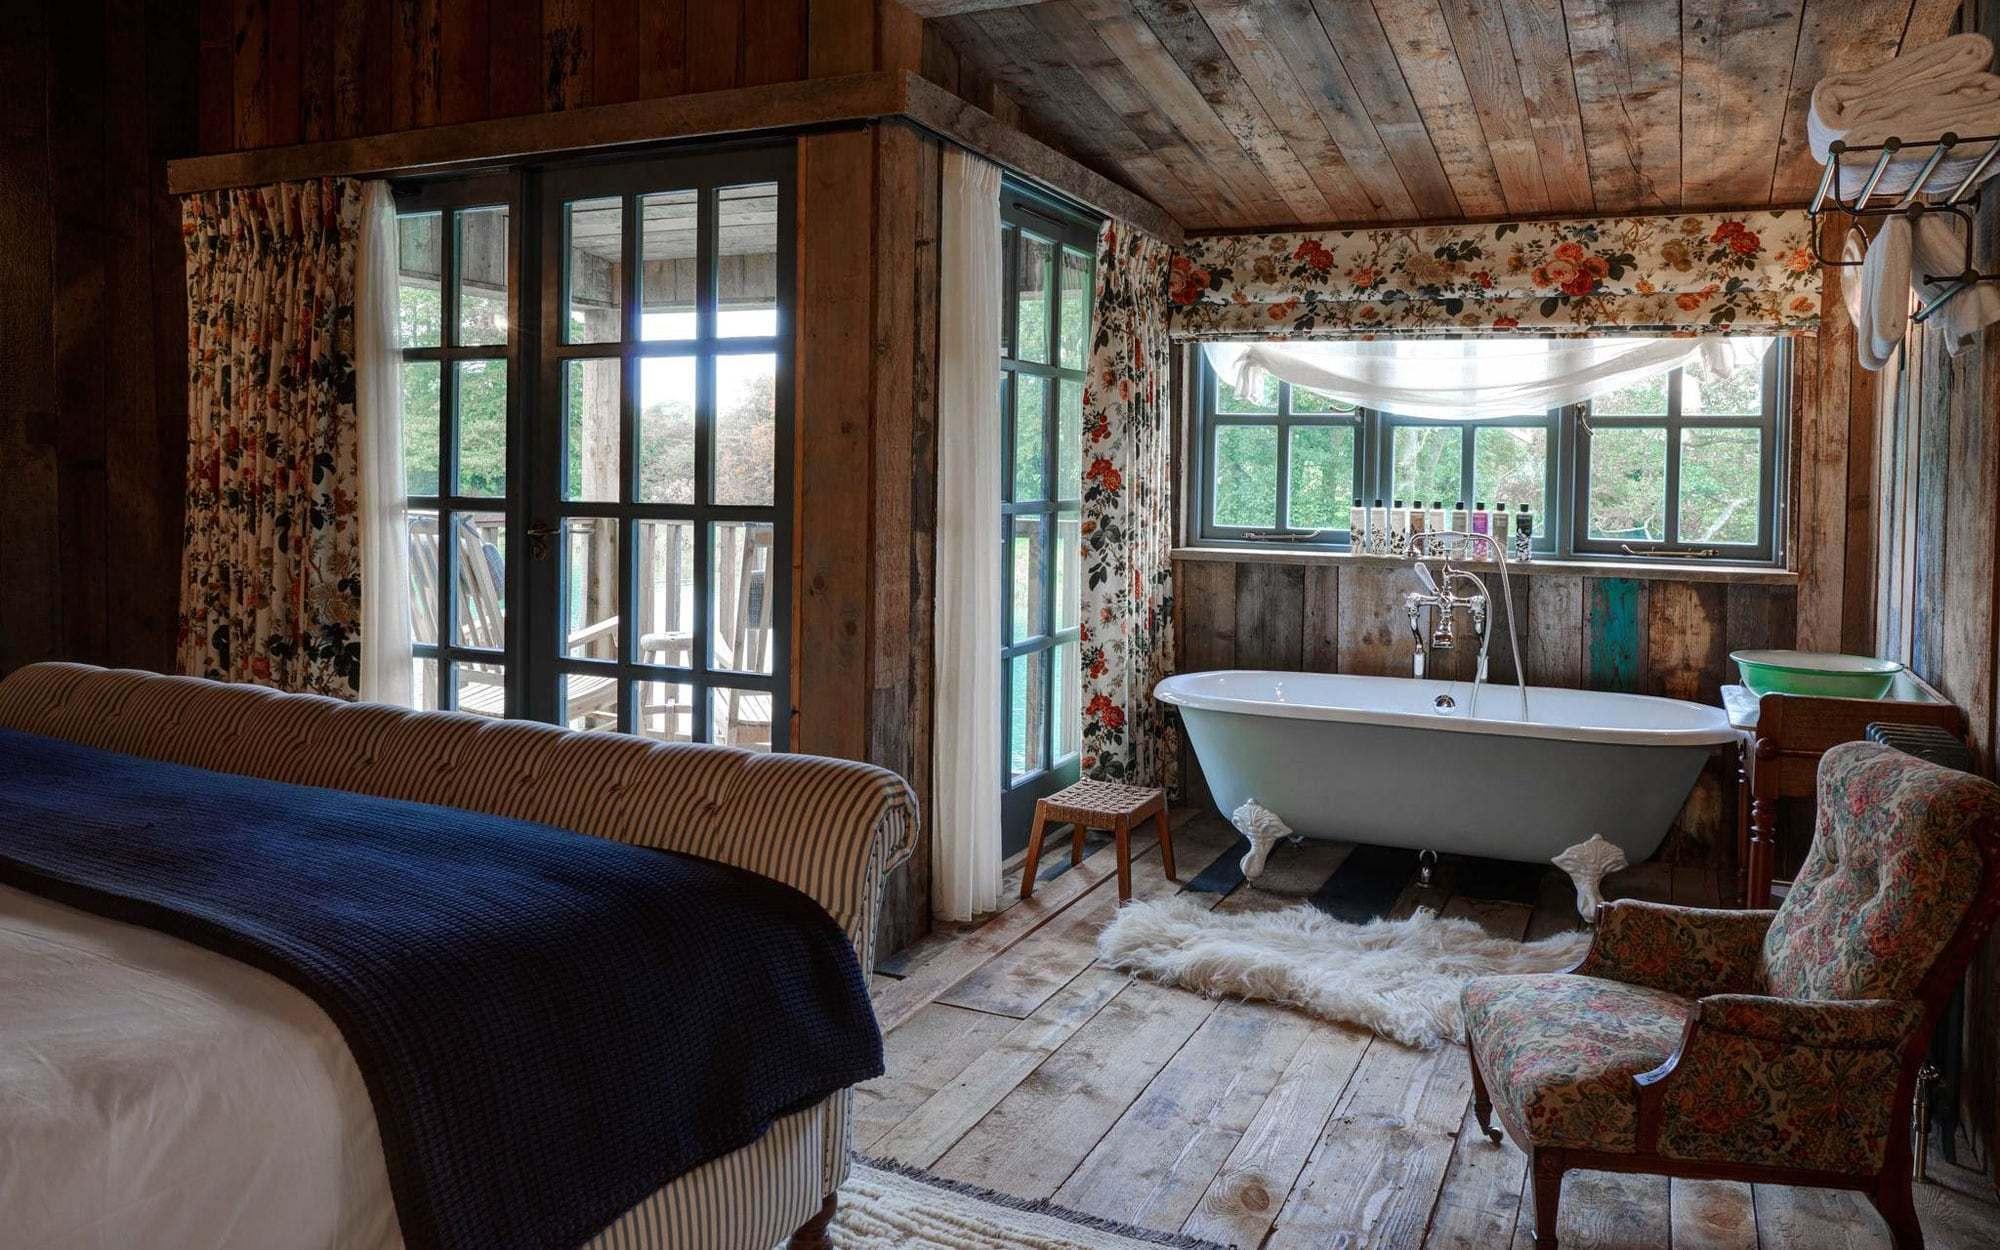 soho-farmhouse-chipping-norton-cotswolds-travel-english-style.jpg